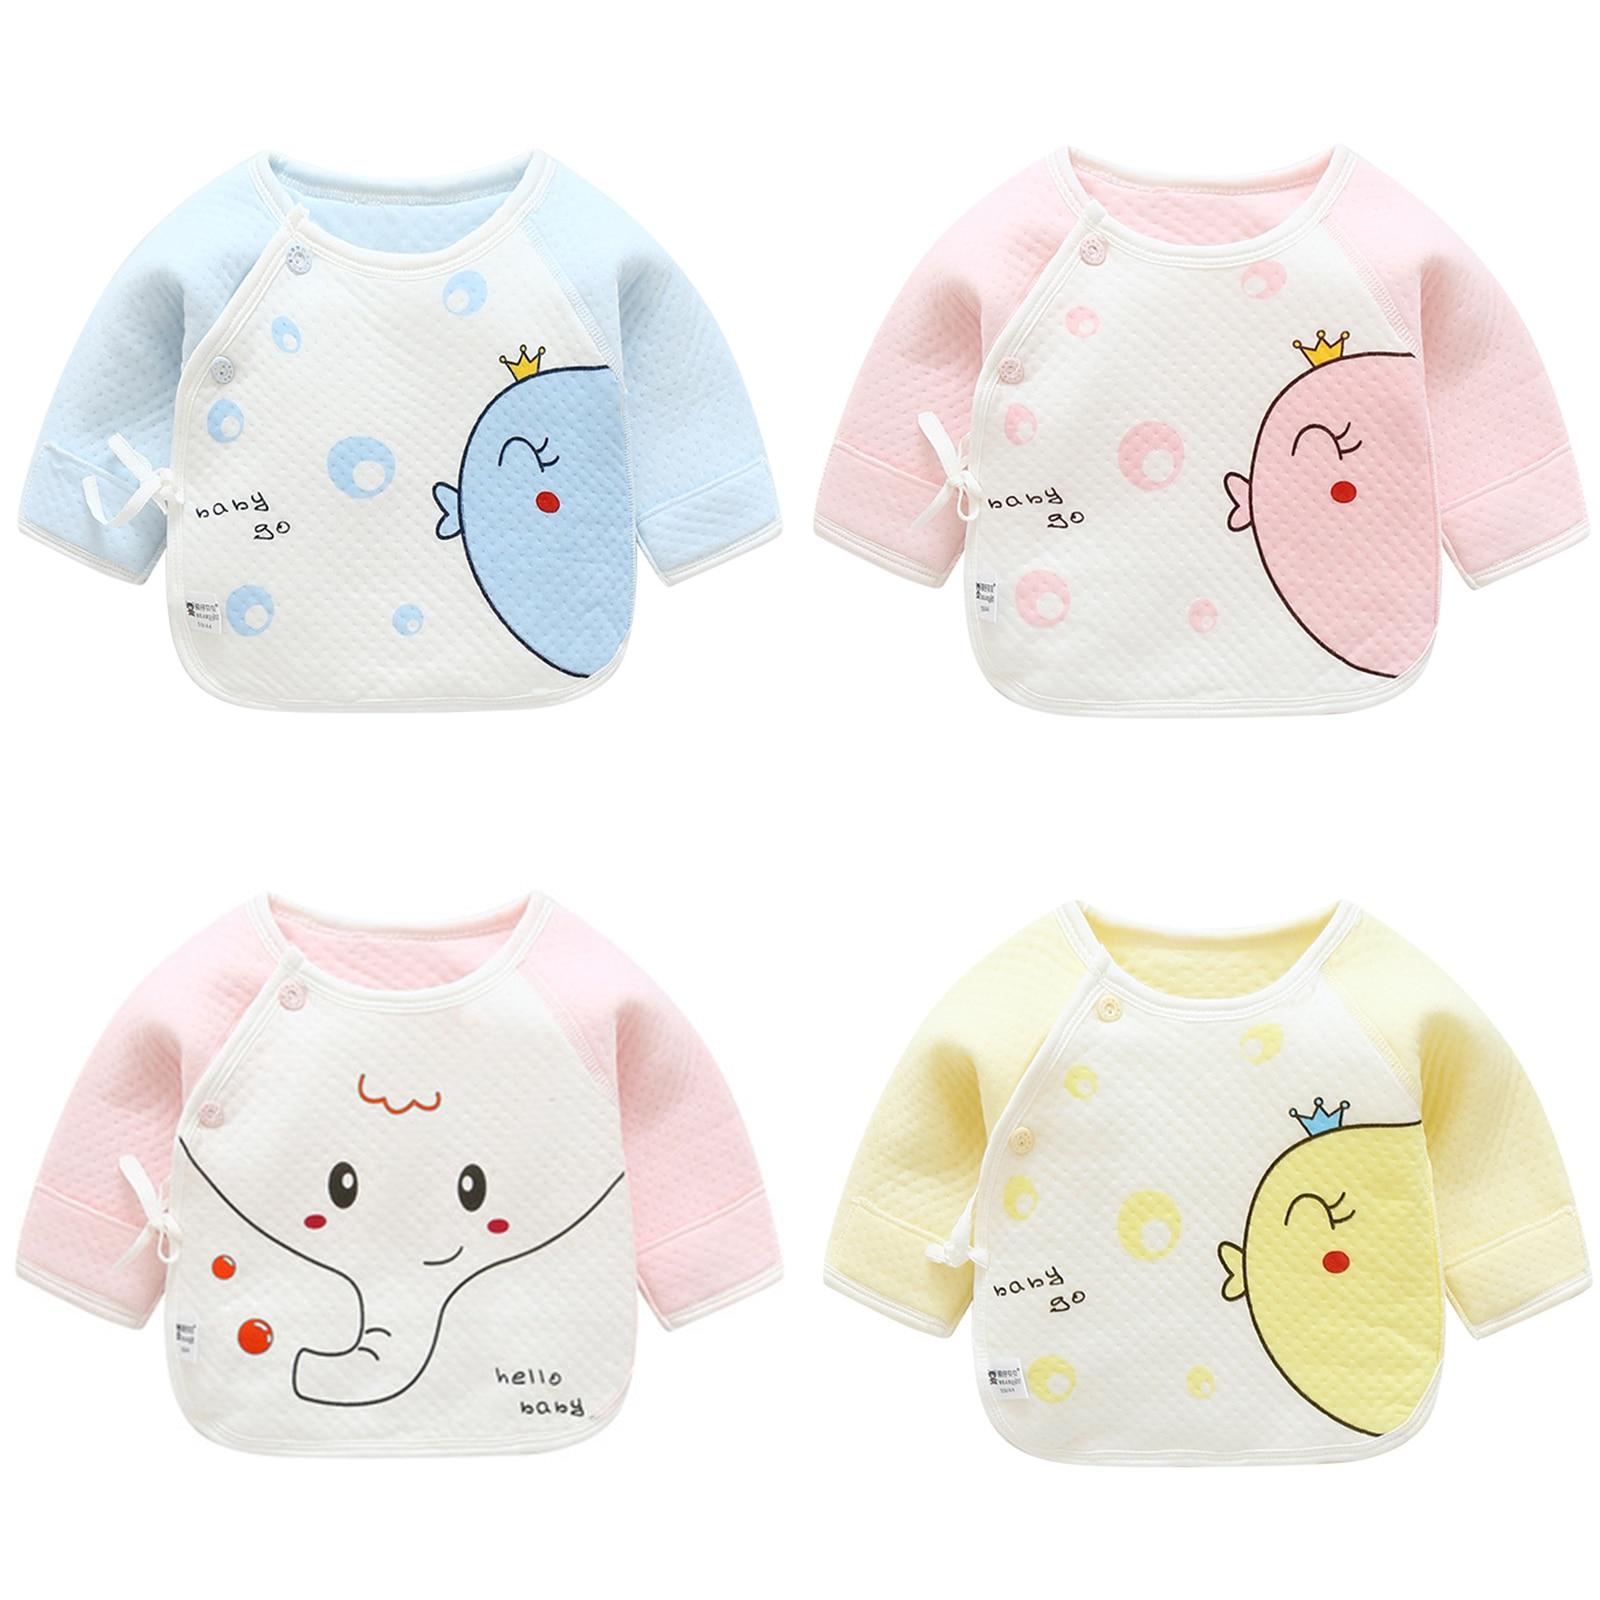 Spring Winter Newborns 0-3 M Baby Clothing 100% Cotton Baby Blouses Half-back Boy Girl Premature Baby Full Sleeve Shirts Summer